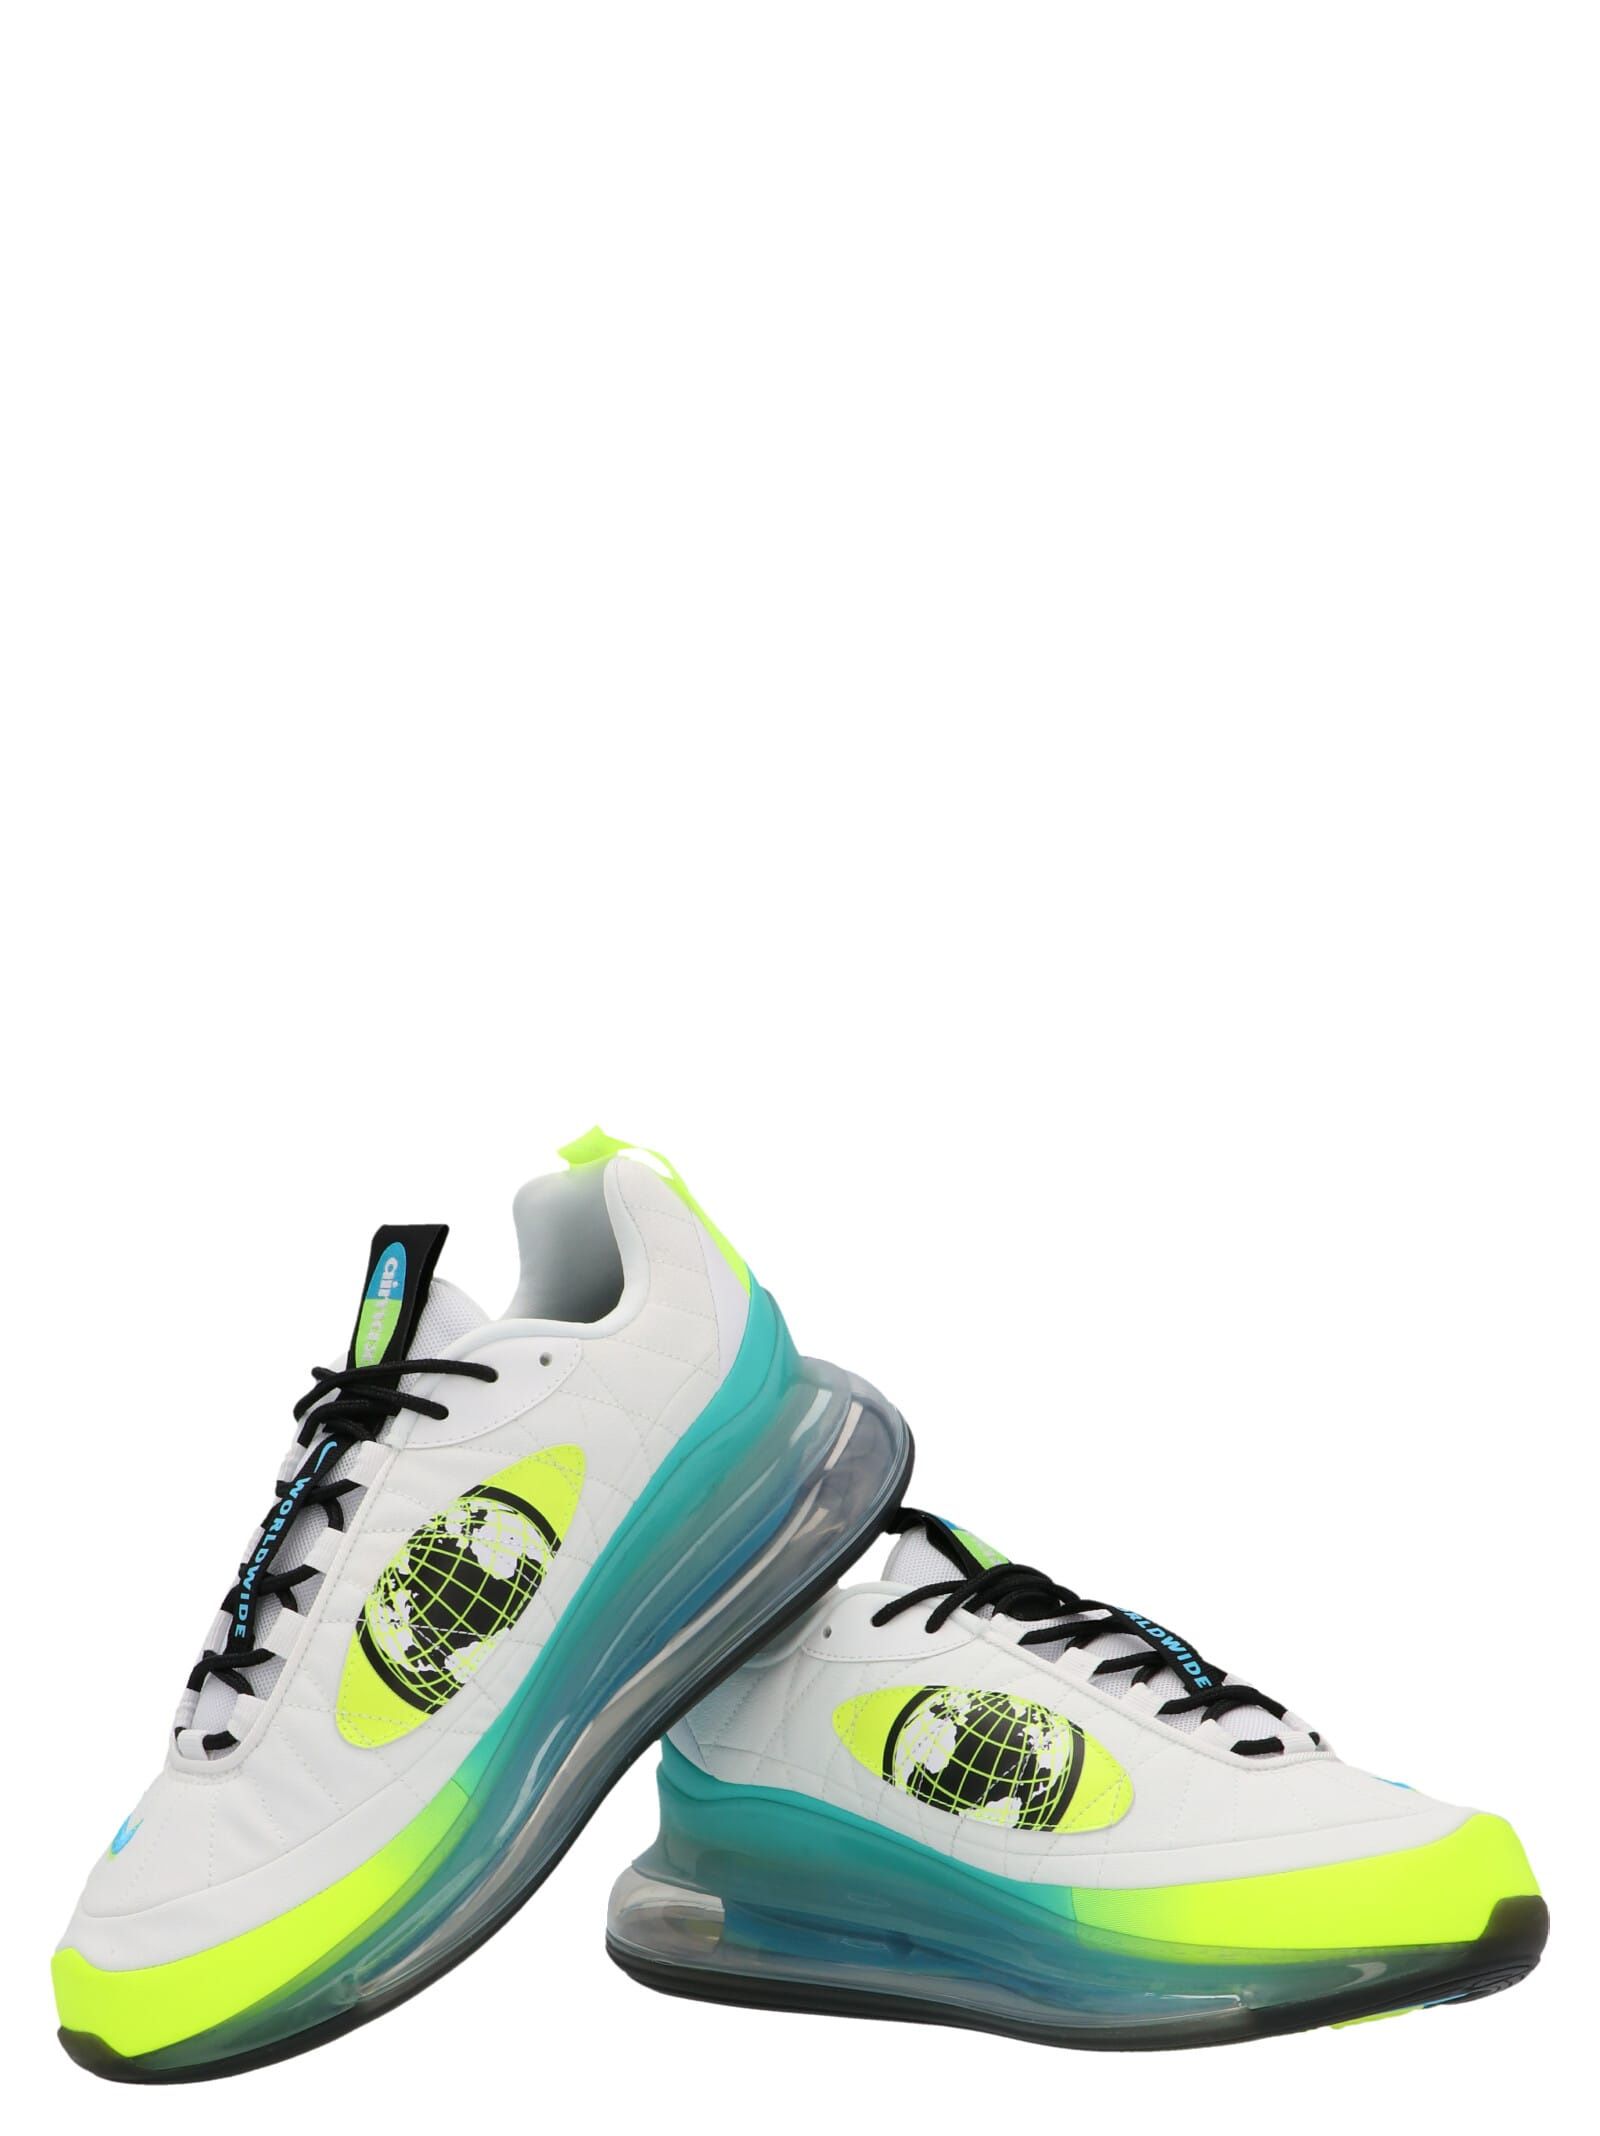 Nike mx-720-818 Ww Shoes